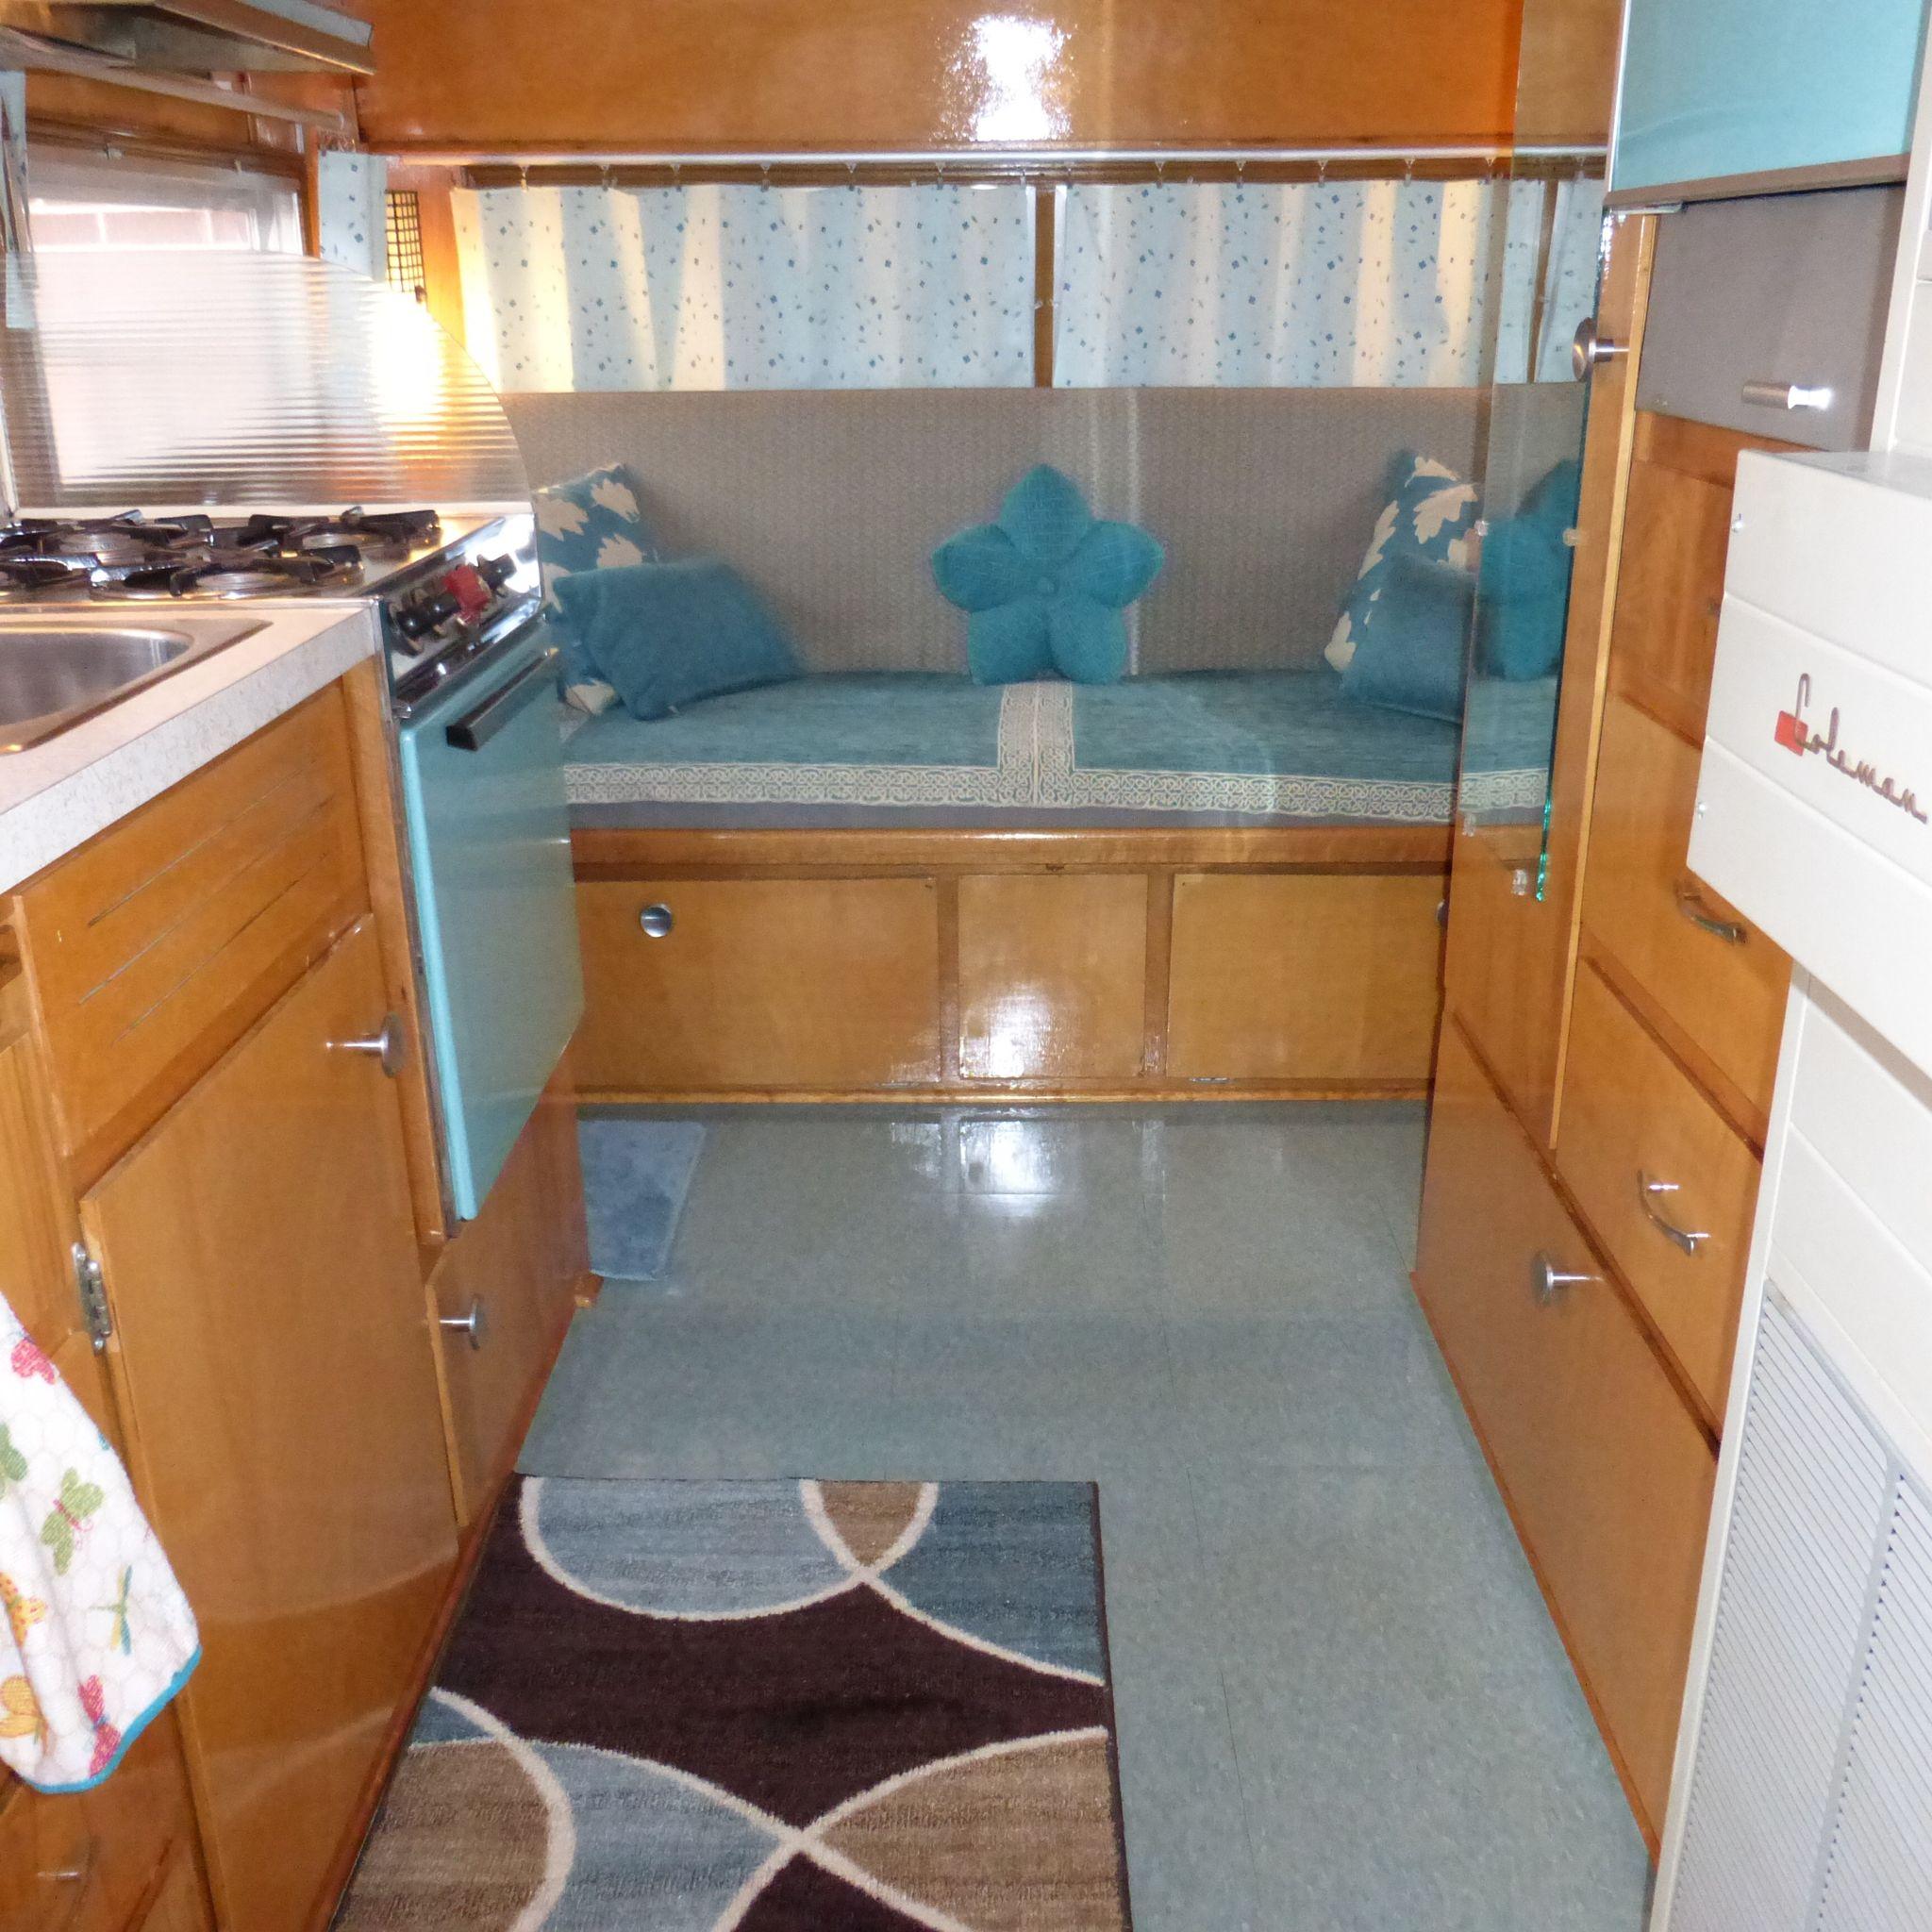 New floor 1965 holiday rambler vct tile installation vintage new floor 1965 holiday rambler vct tile installation dailygadgetfo Choice Image